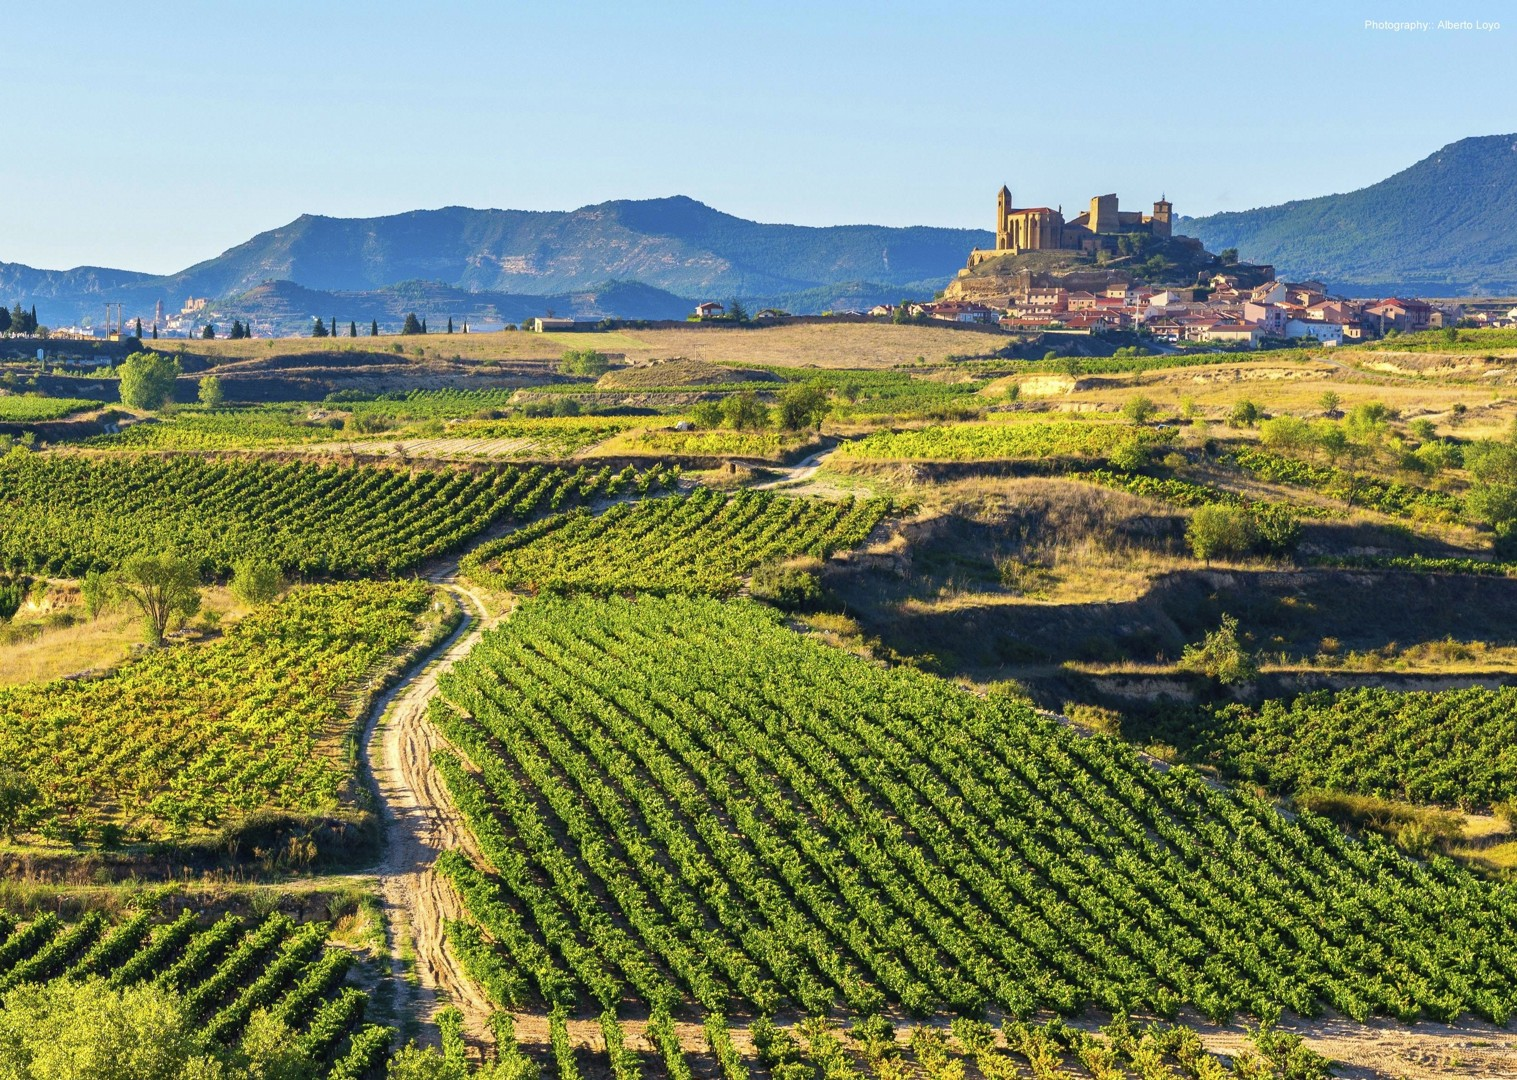 402732421La-Rioja-Alberto-Loyo.jpg - Northern Spain - Rioja - Ruta del Vino - Guided Road Cycling Holiday - Road Cycling